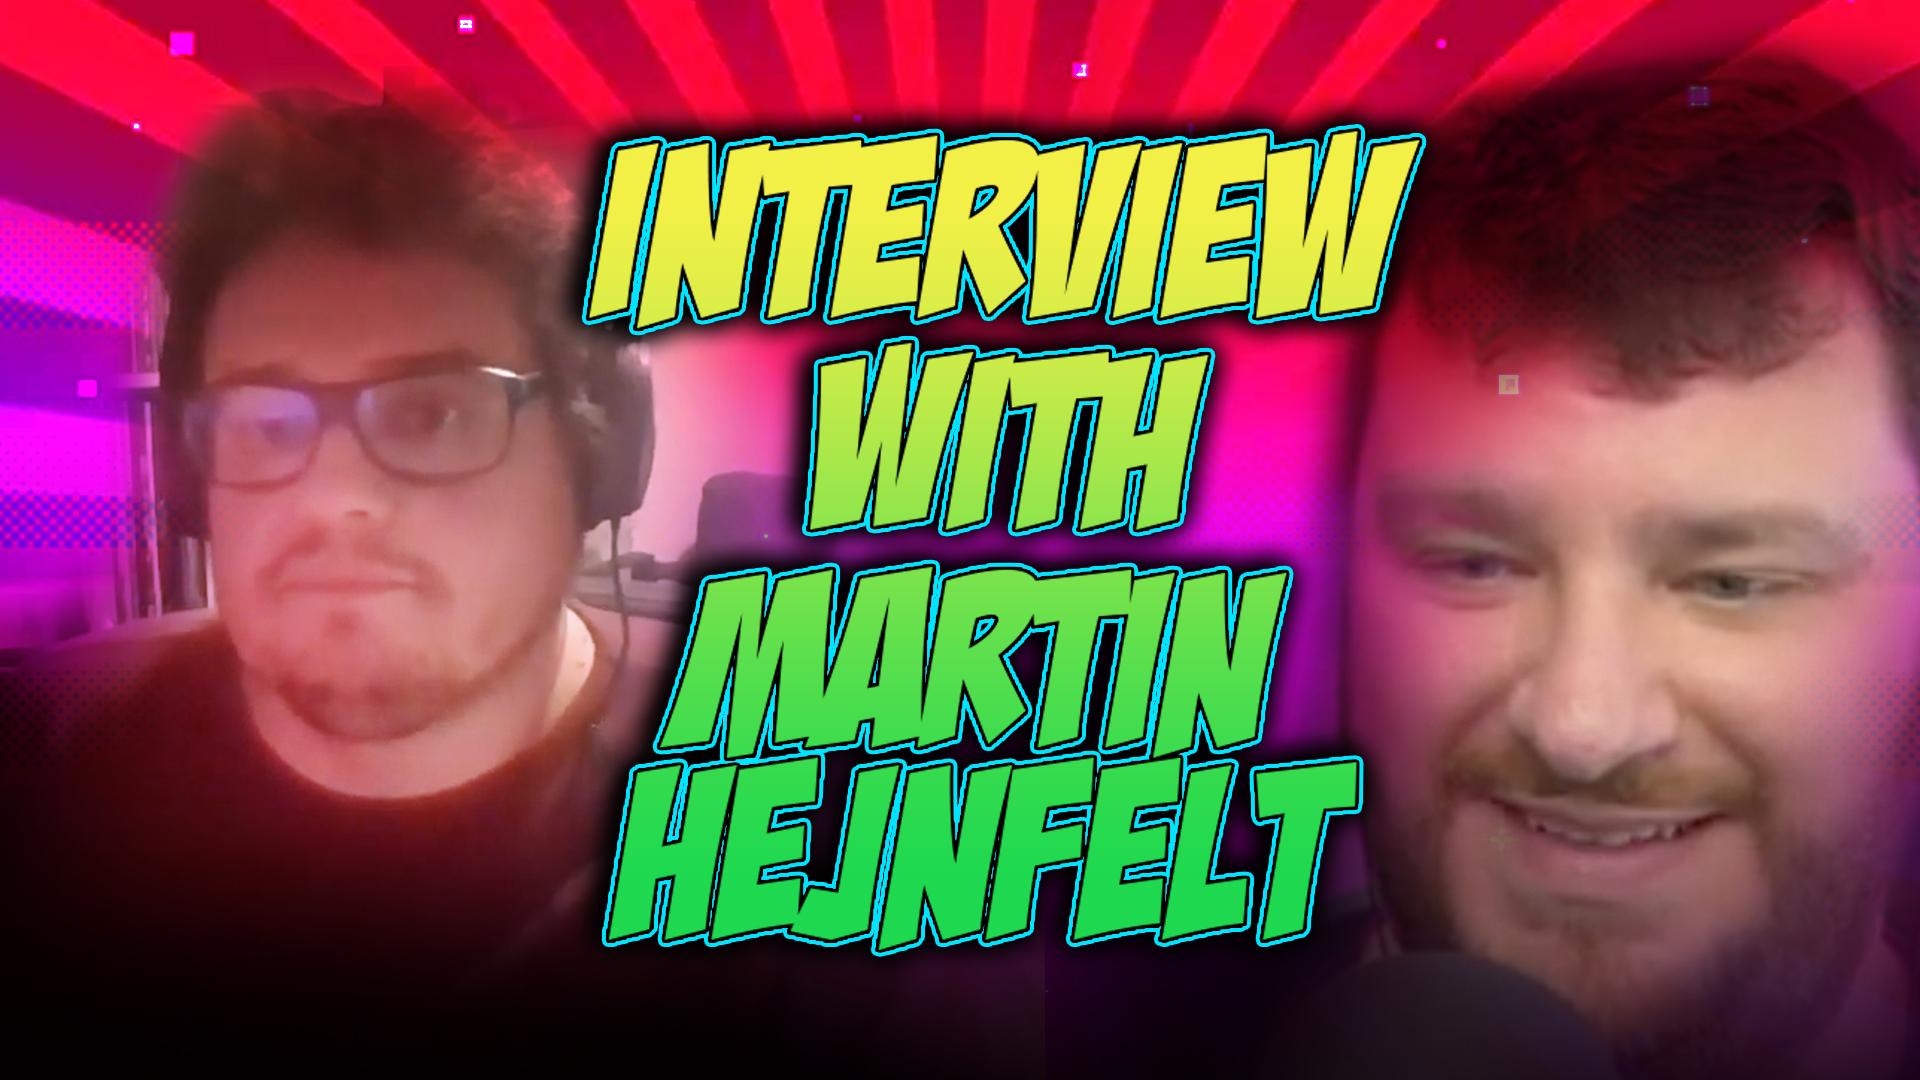 Interview with Martin Hejnfelt